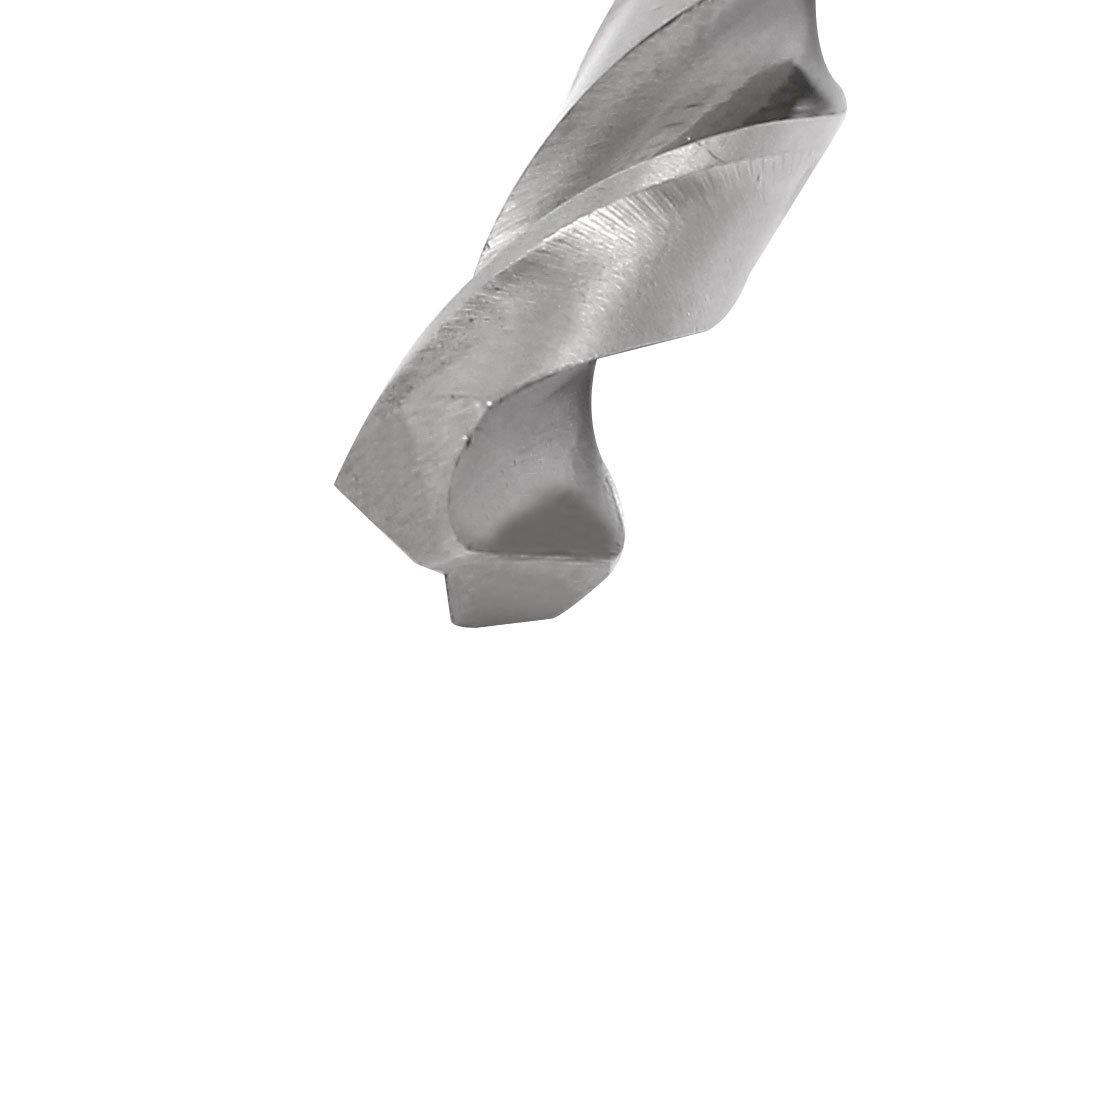 uxcell 8.1mm Twist Drill High Speed Steel Bit HSS-4241 for Steel Aluminum Alloy 5pcs